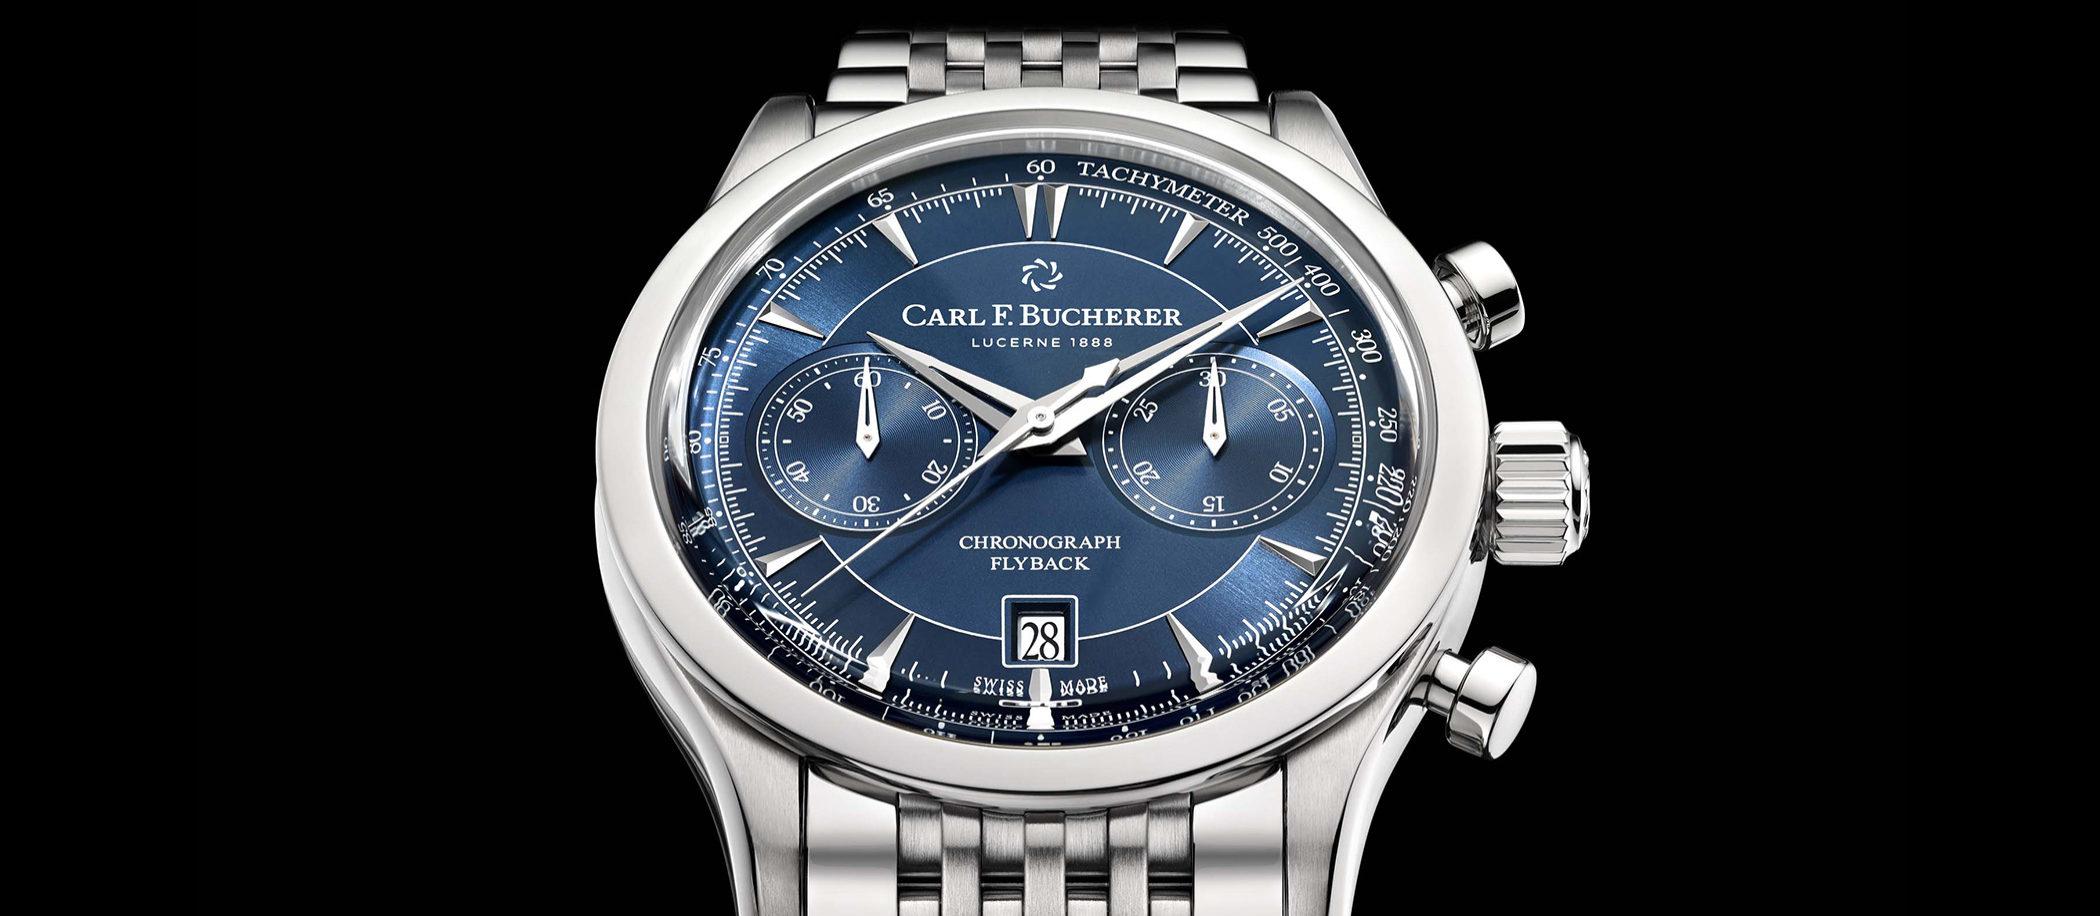 Carl F. Bucherer Manero Flyback Blue